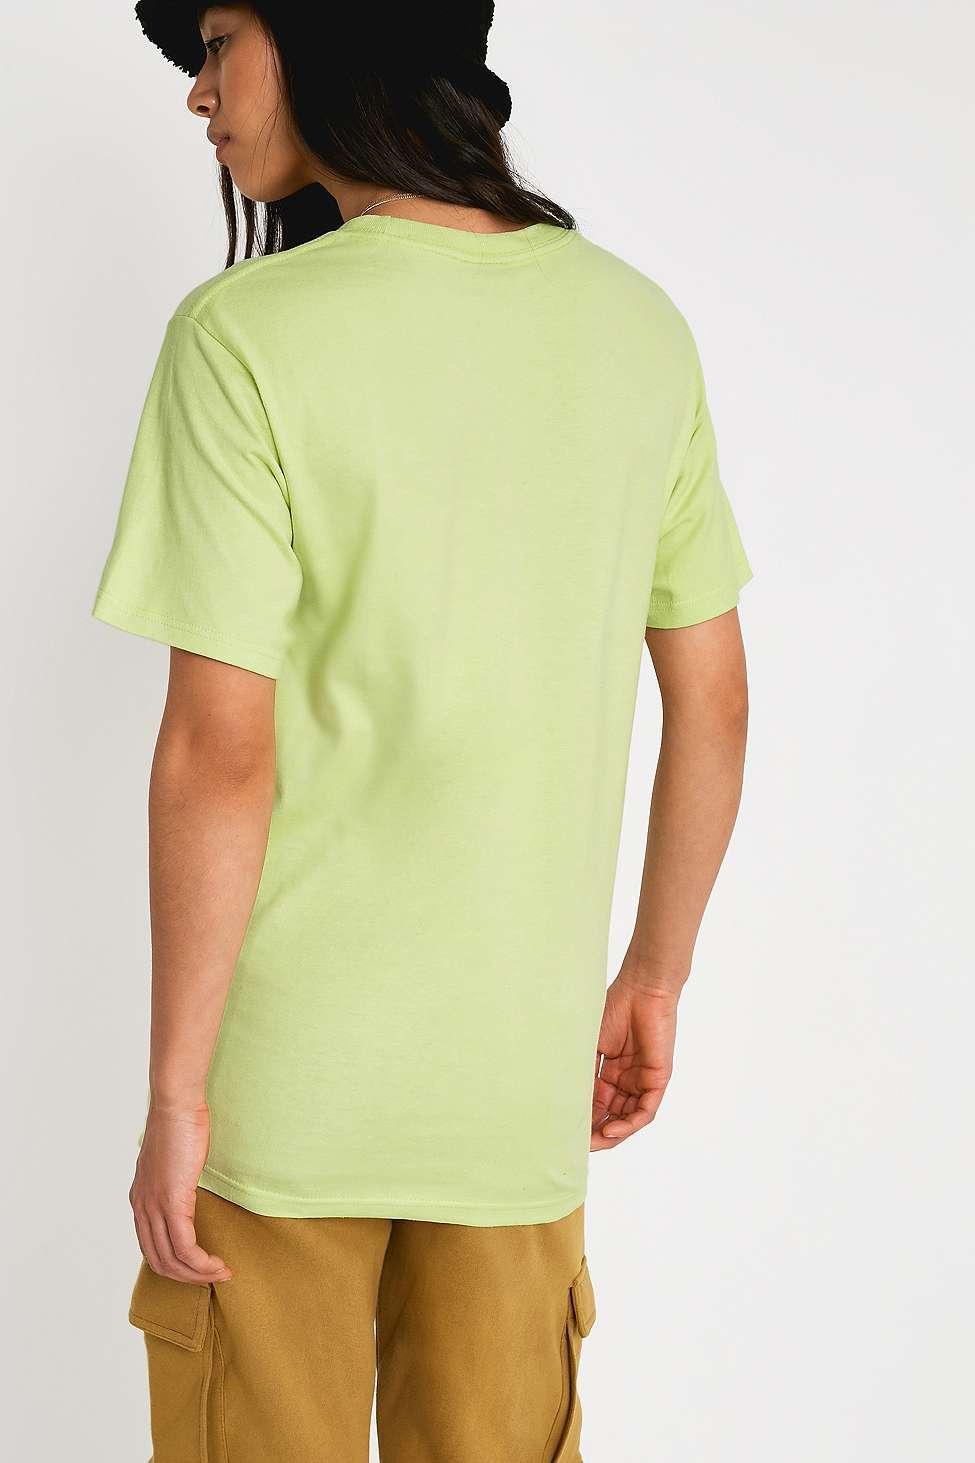 6be8a6938 Stussy - Link Pale Green T-shirt - Womens Xs - Lyst. View fullscreen